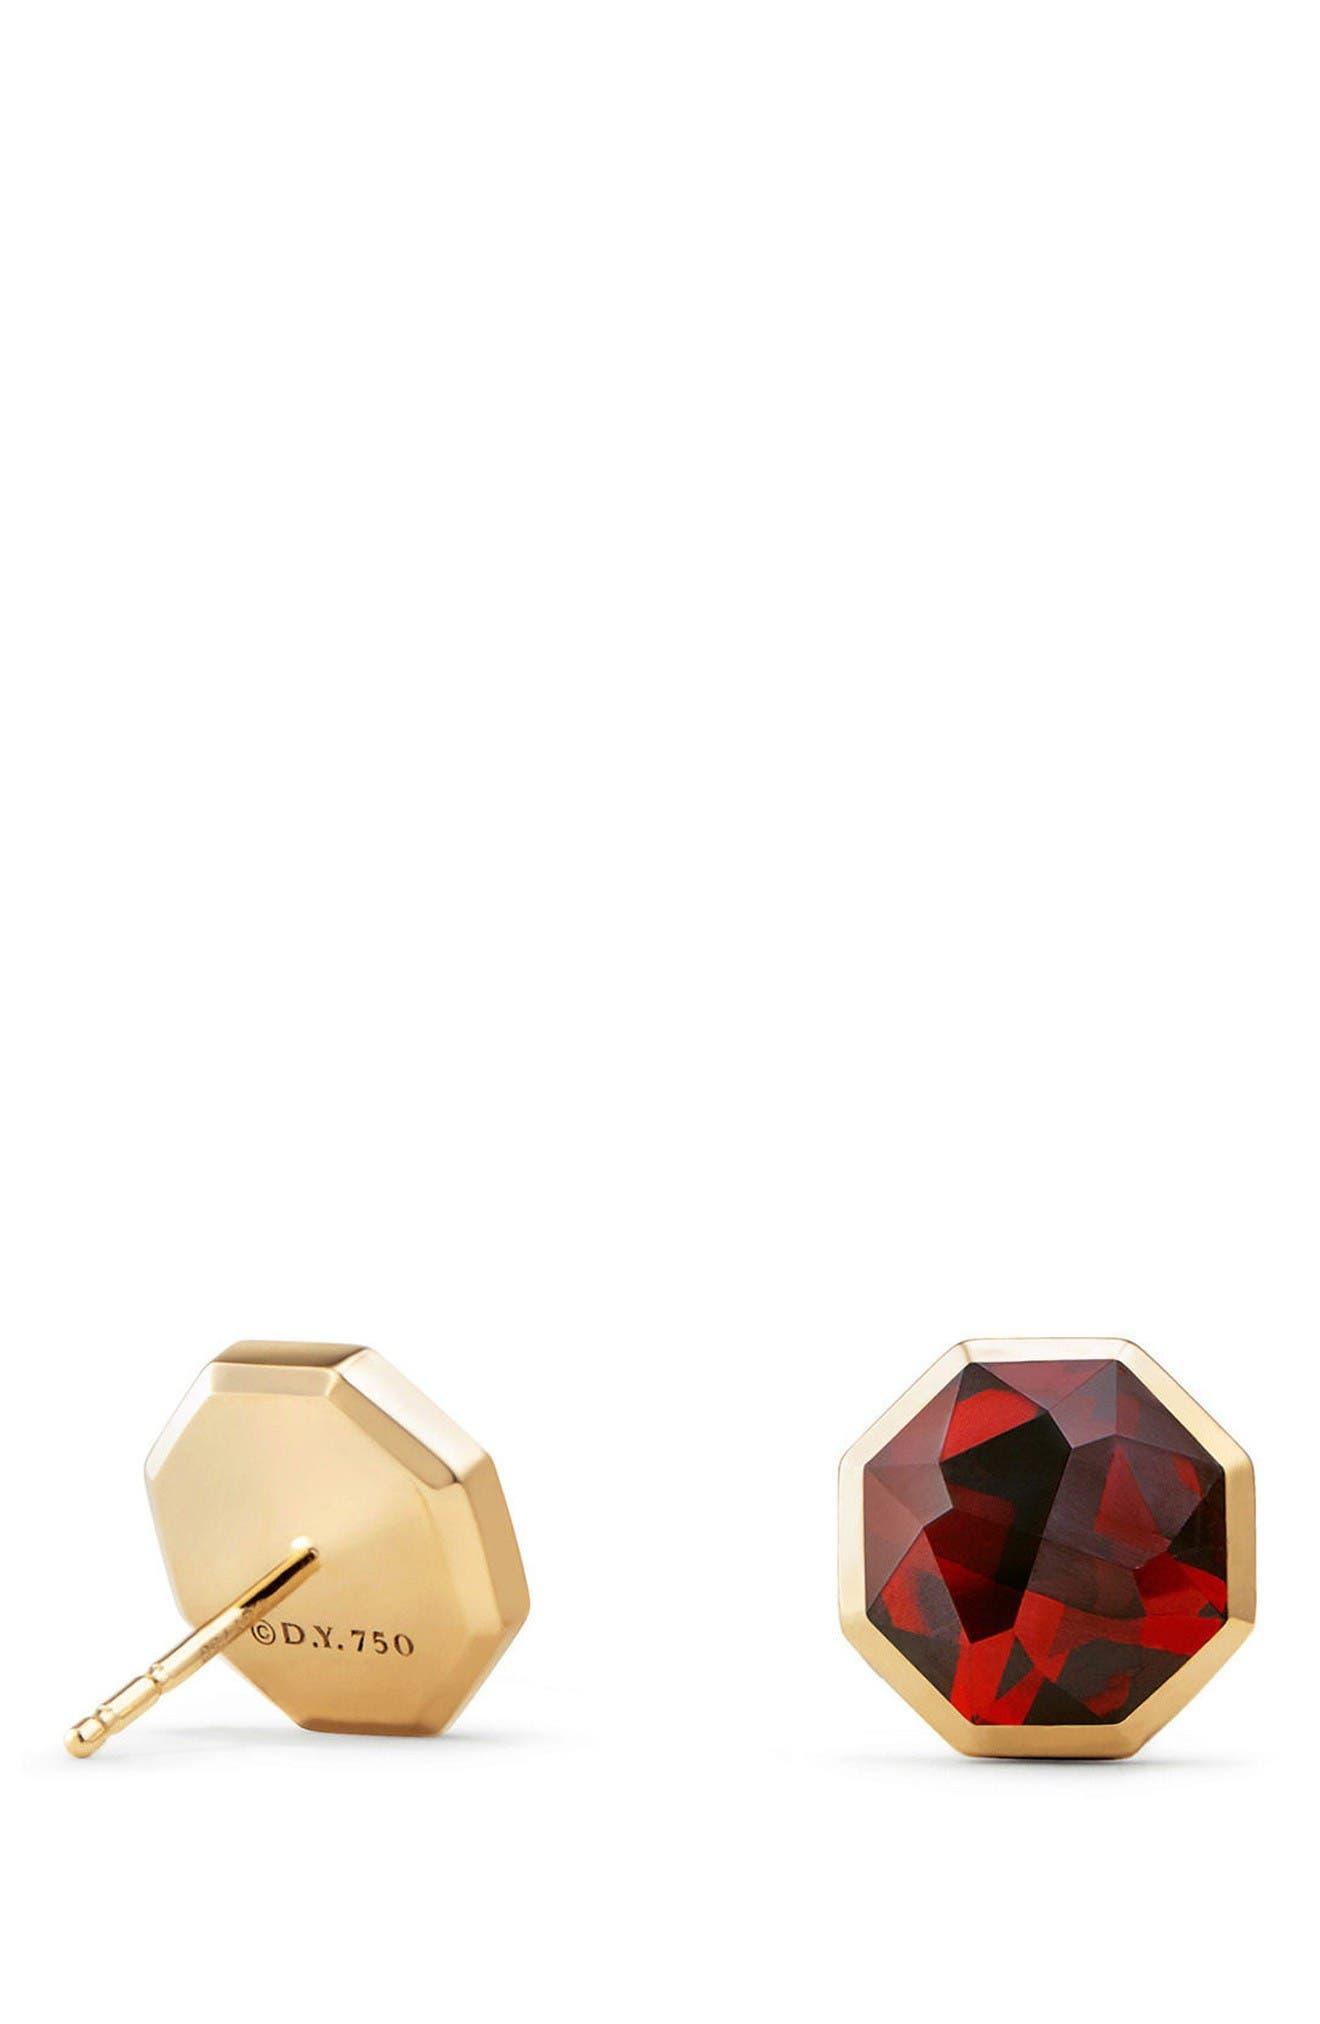 Guilin Octagon Earrings in 18K Gold,                             Alternate thumbnail 2, color,                             Yellow Gold/ Garnet